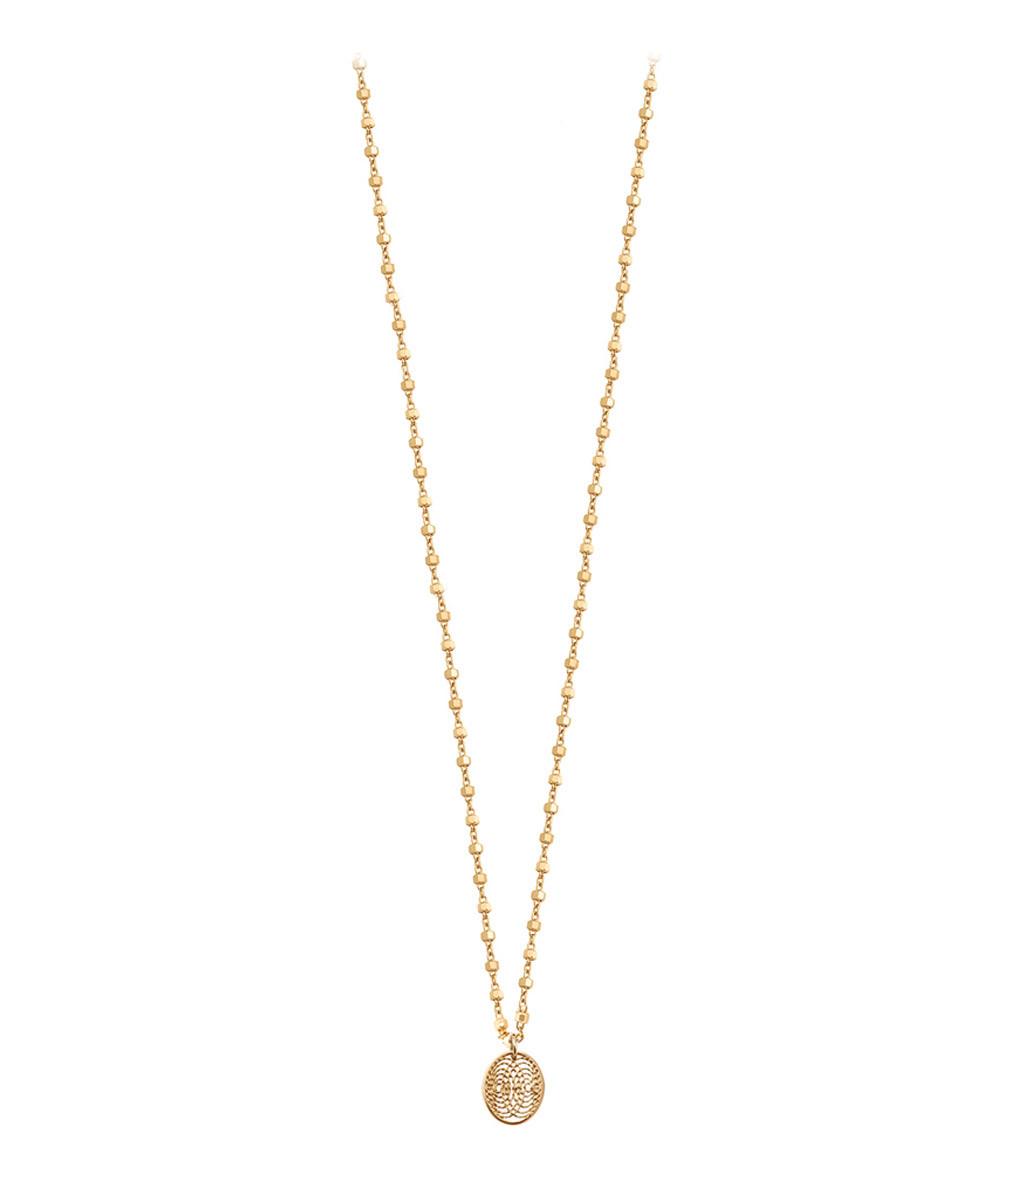 Sautoir Aura Chaîne Diamant 90 cm - Charlet